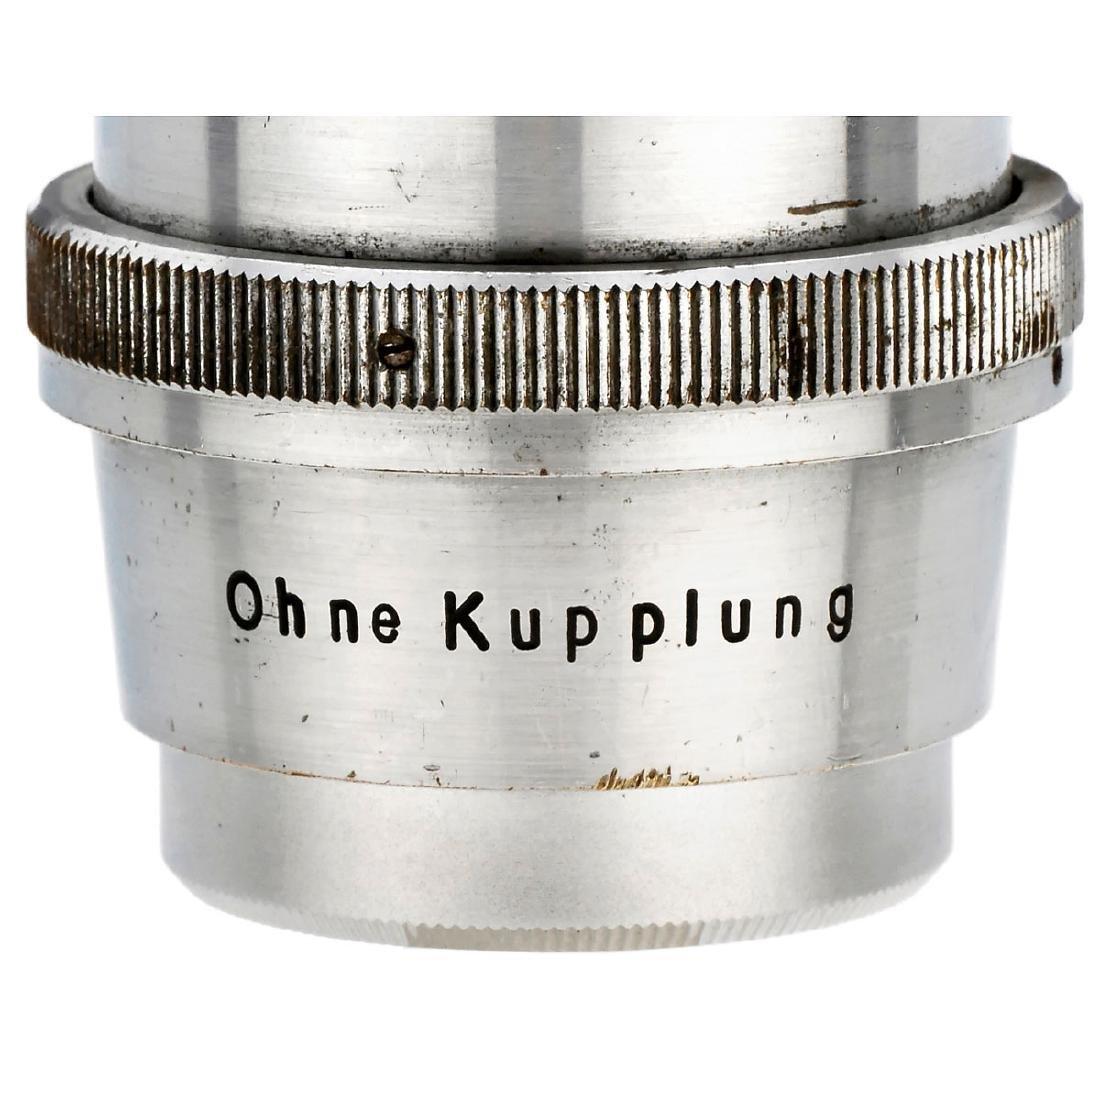 Tele Megor 5,5/25 cm for Leica Screw-Mount - 2